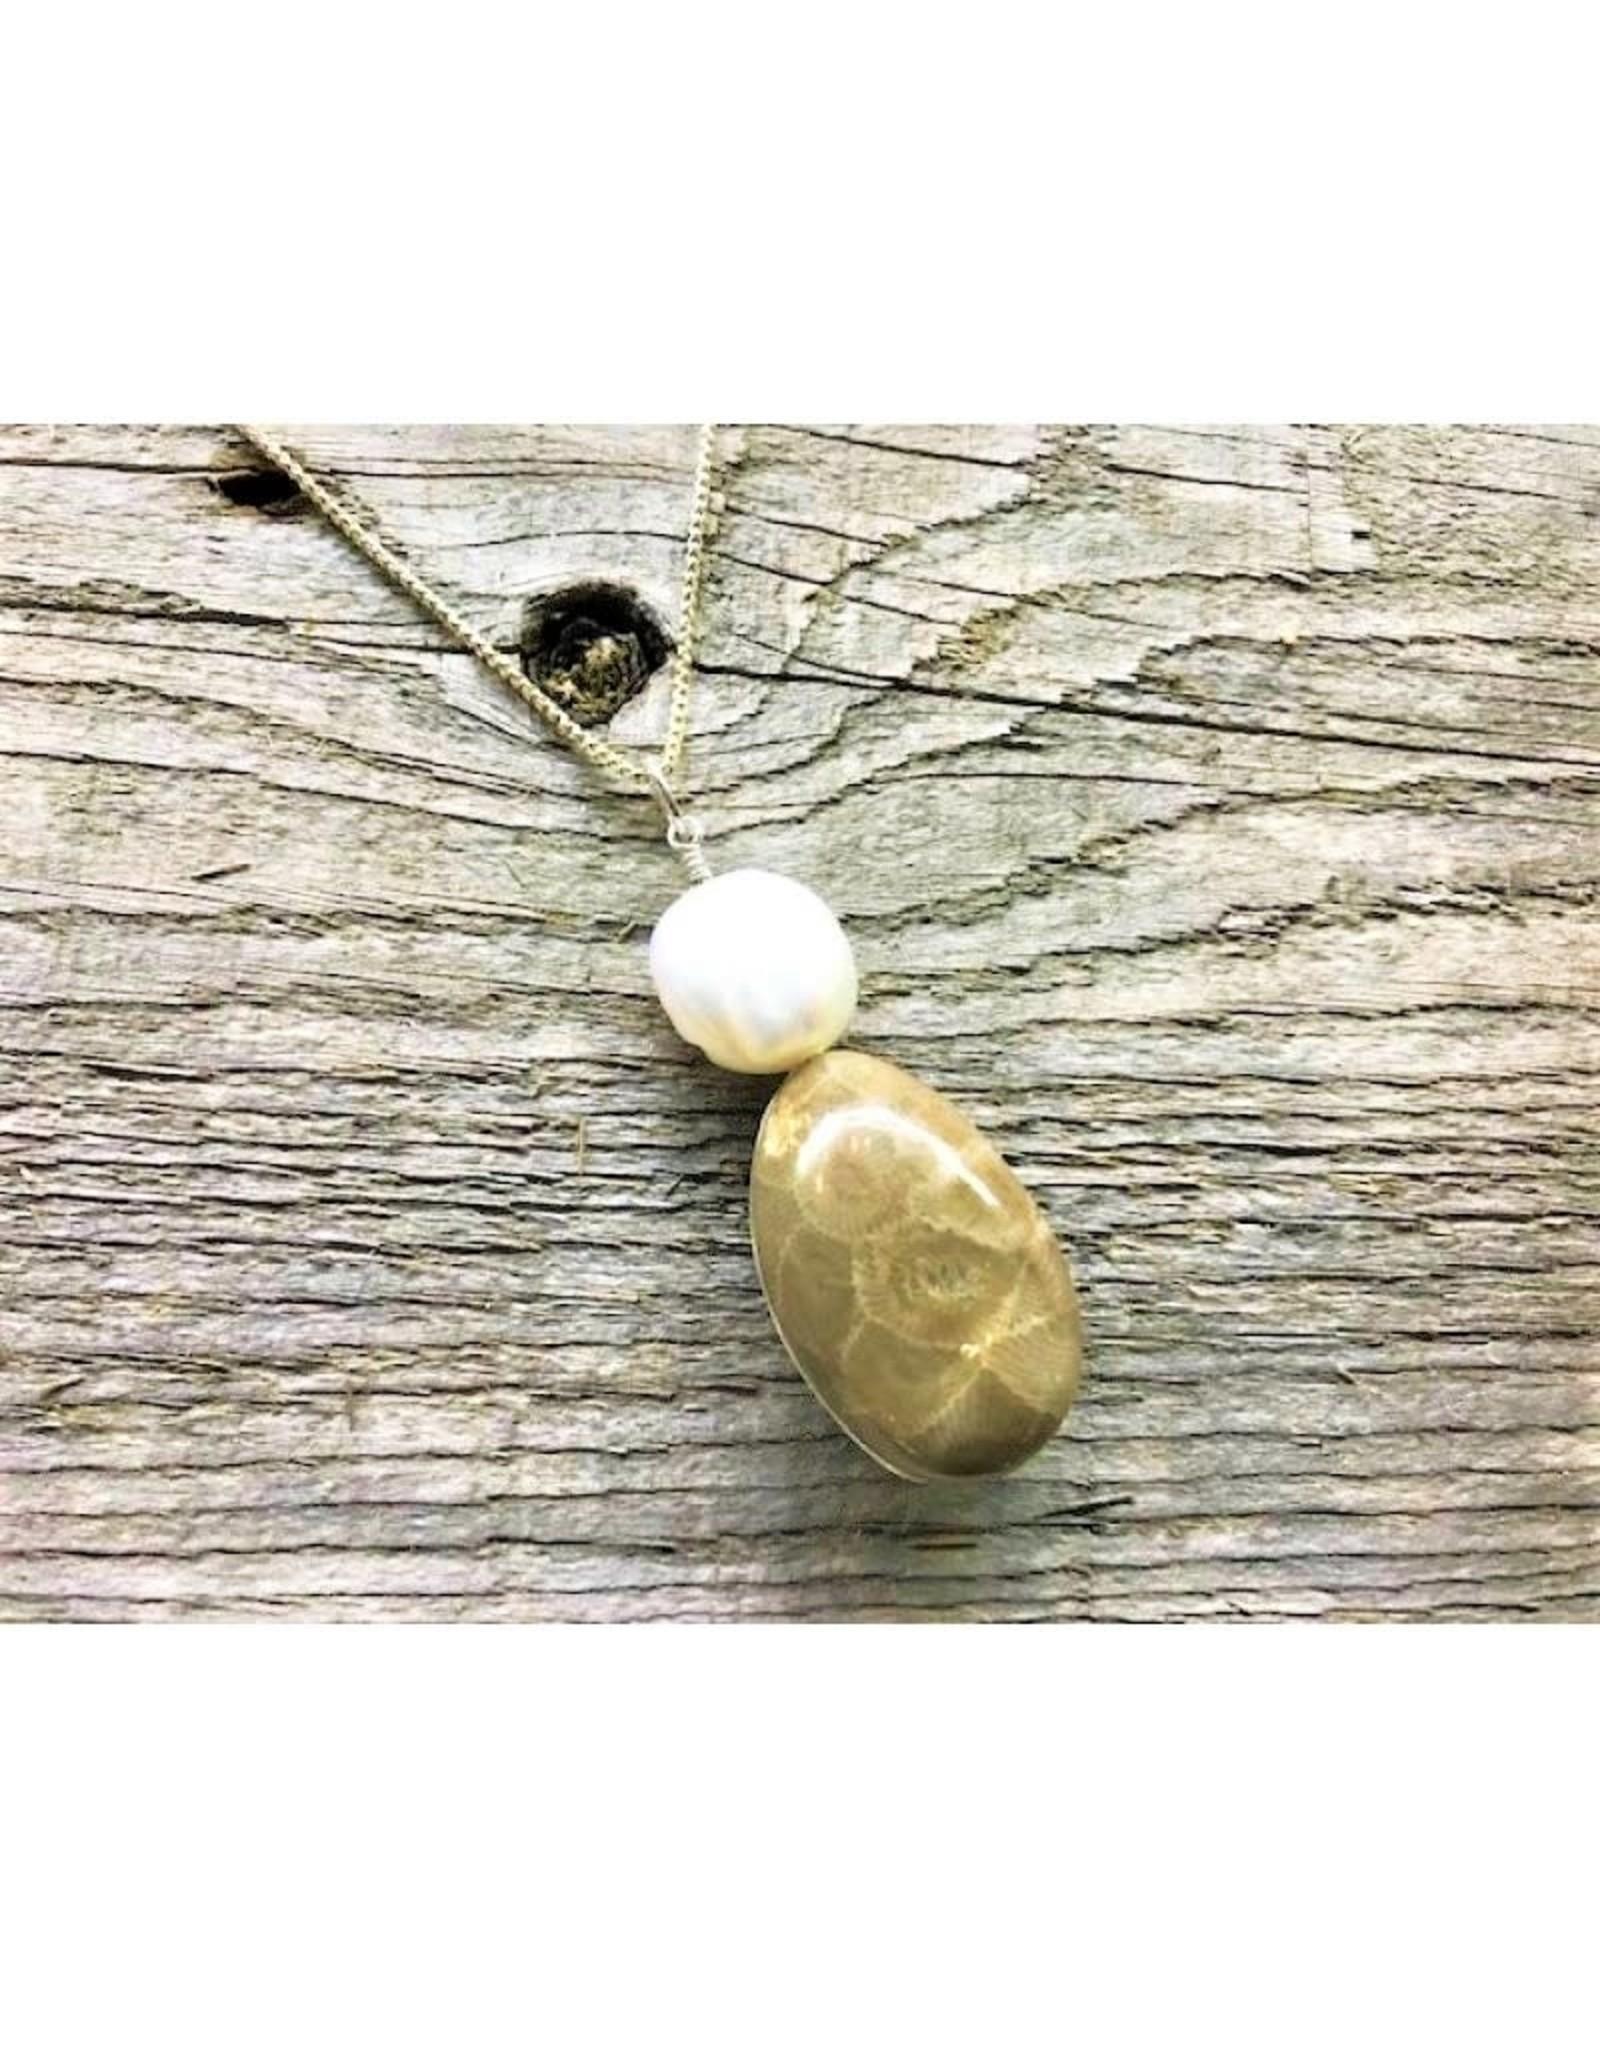 Necklace Pendant - Petoskey Stone & Freshwater Pearl